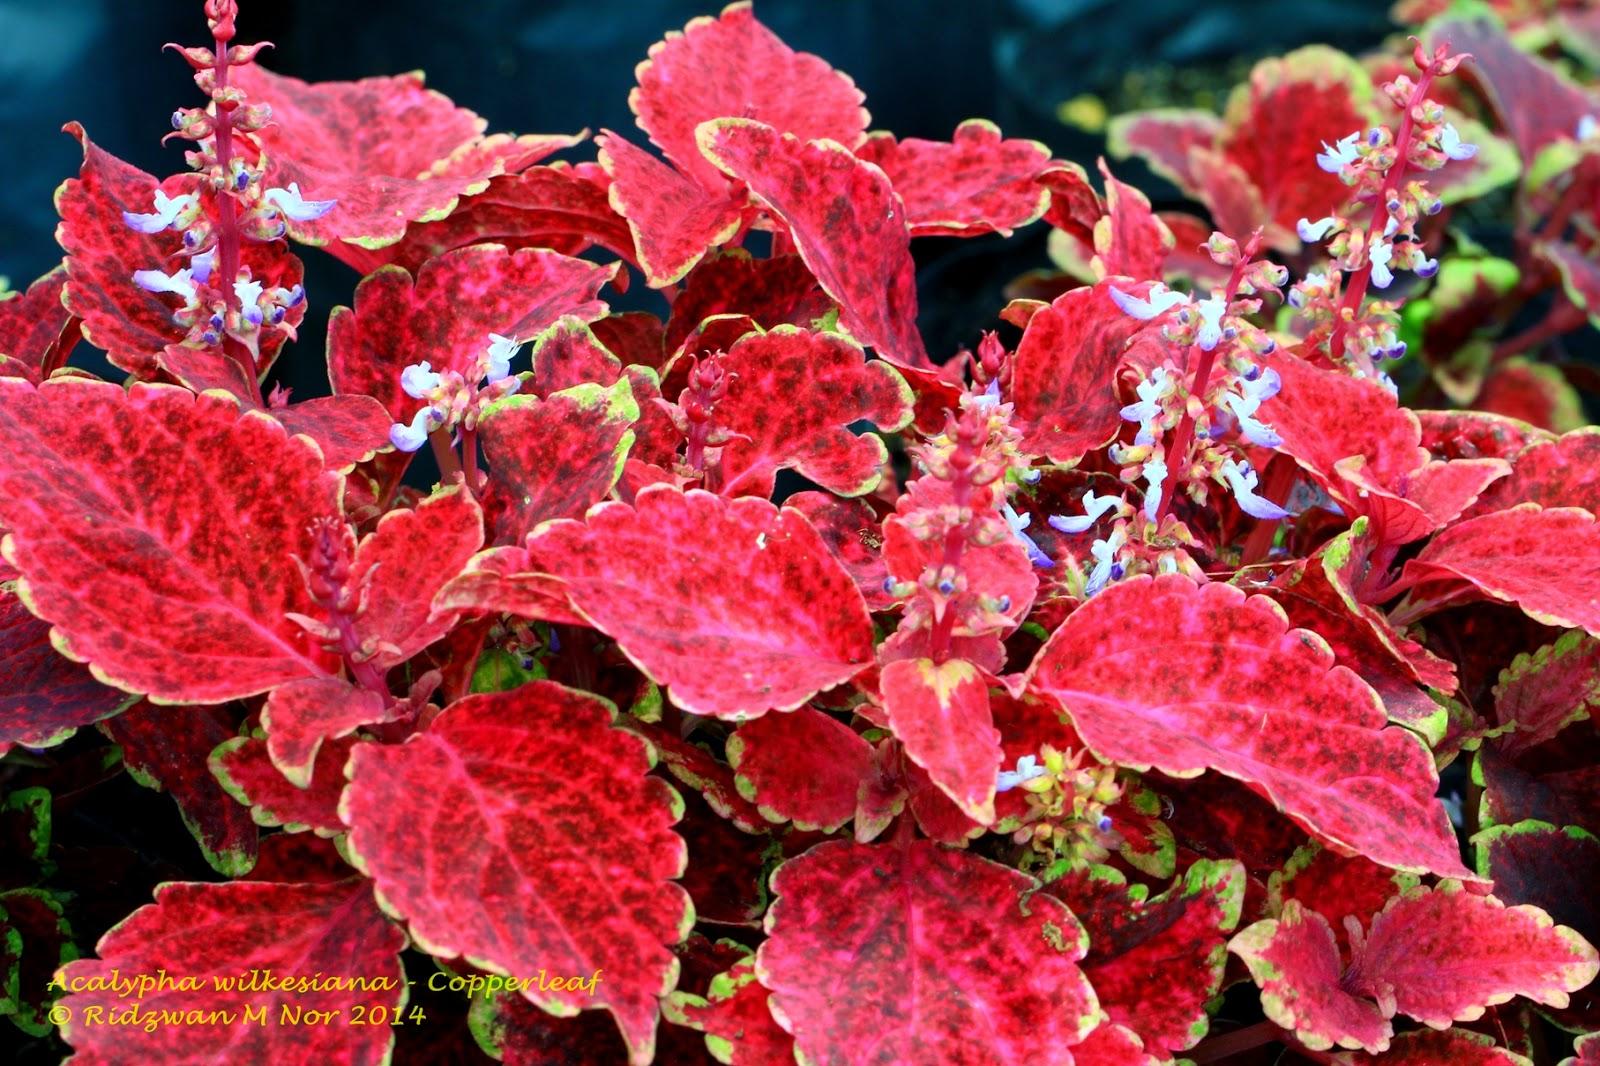 Acalypha Wilkesiana Copperleaf Flowers Around Us By Ridzwan Mn